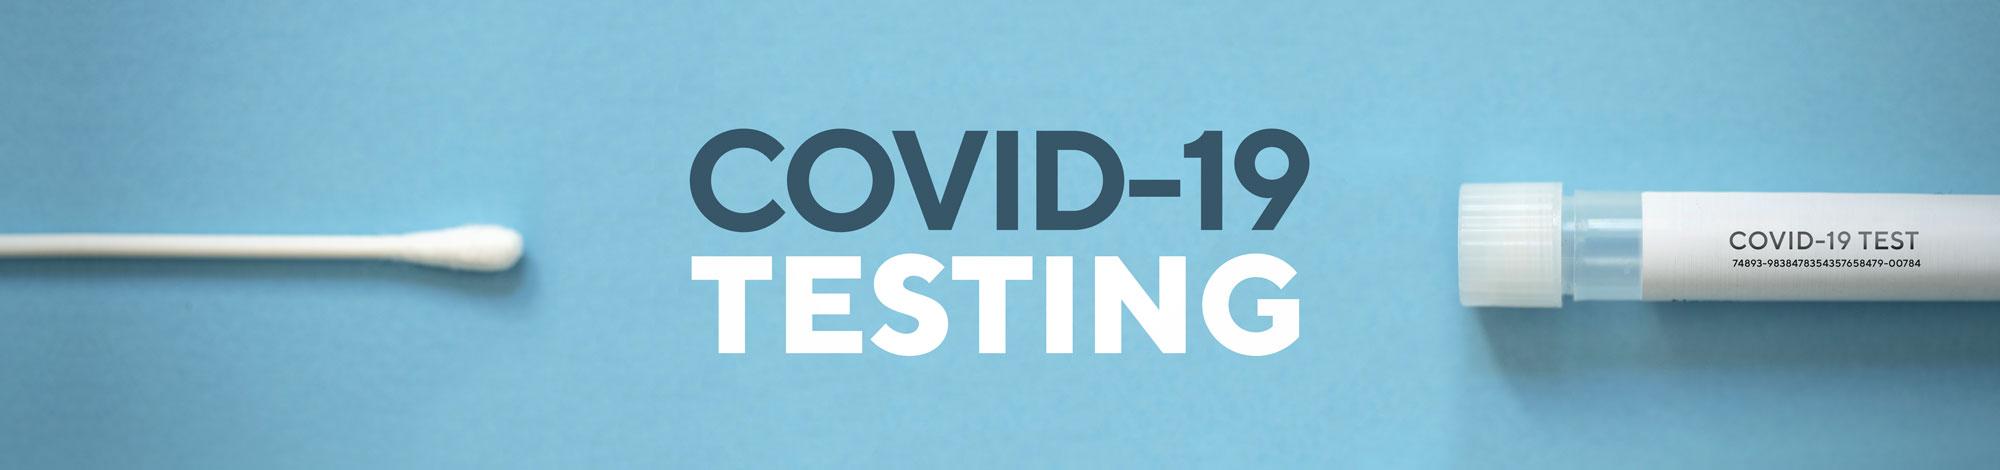 Fee COVID-19 Testing in Brunswick